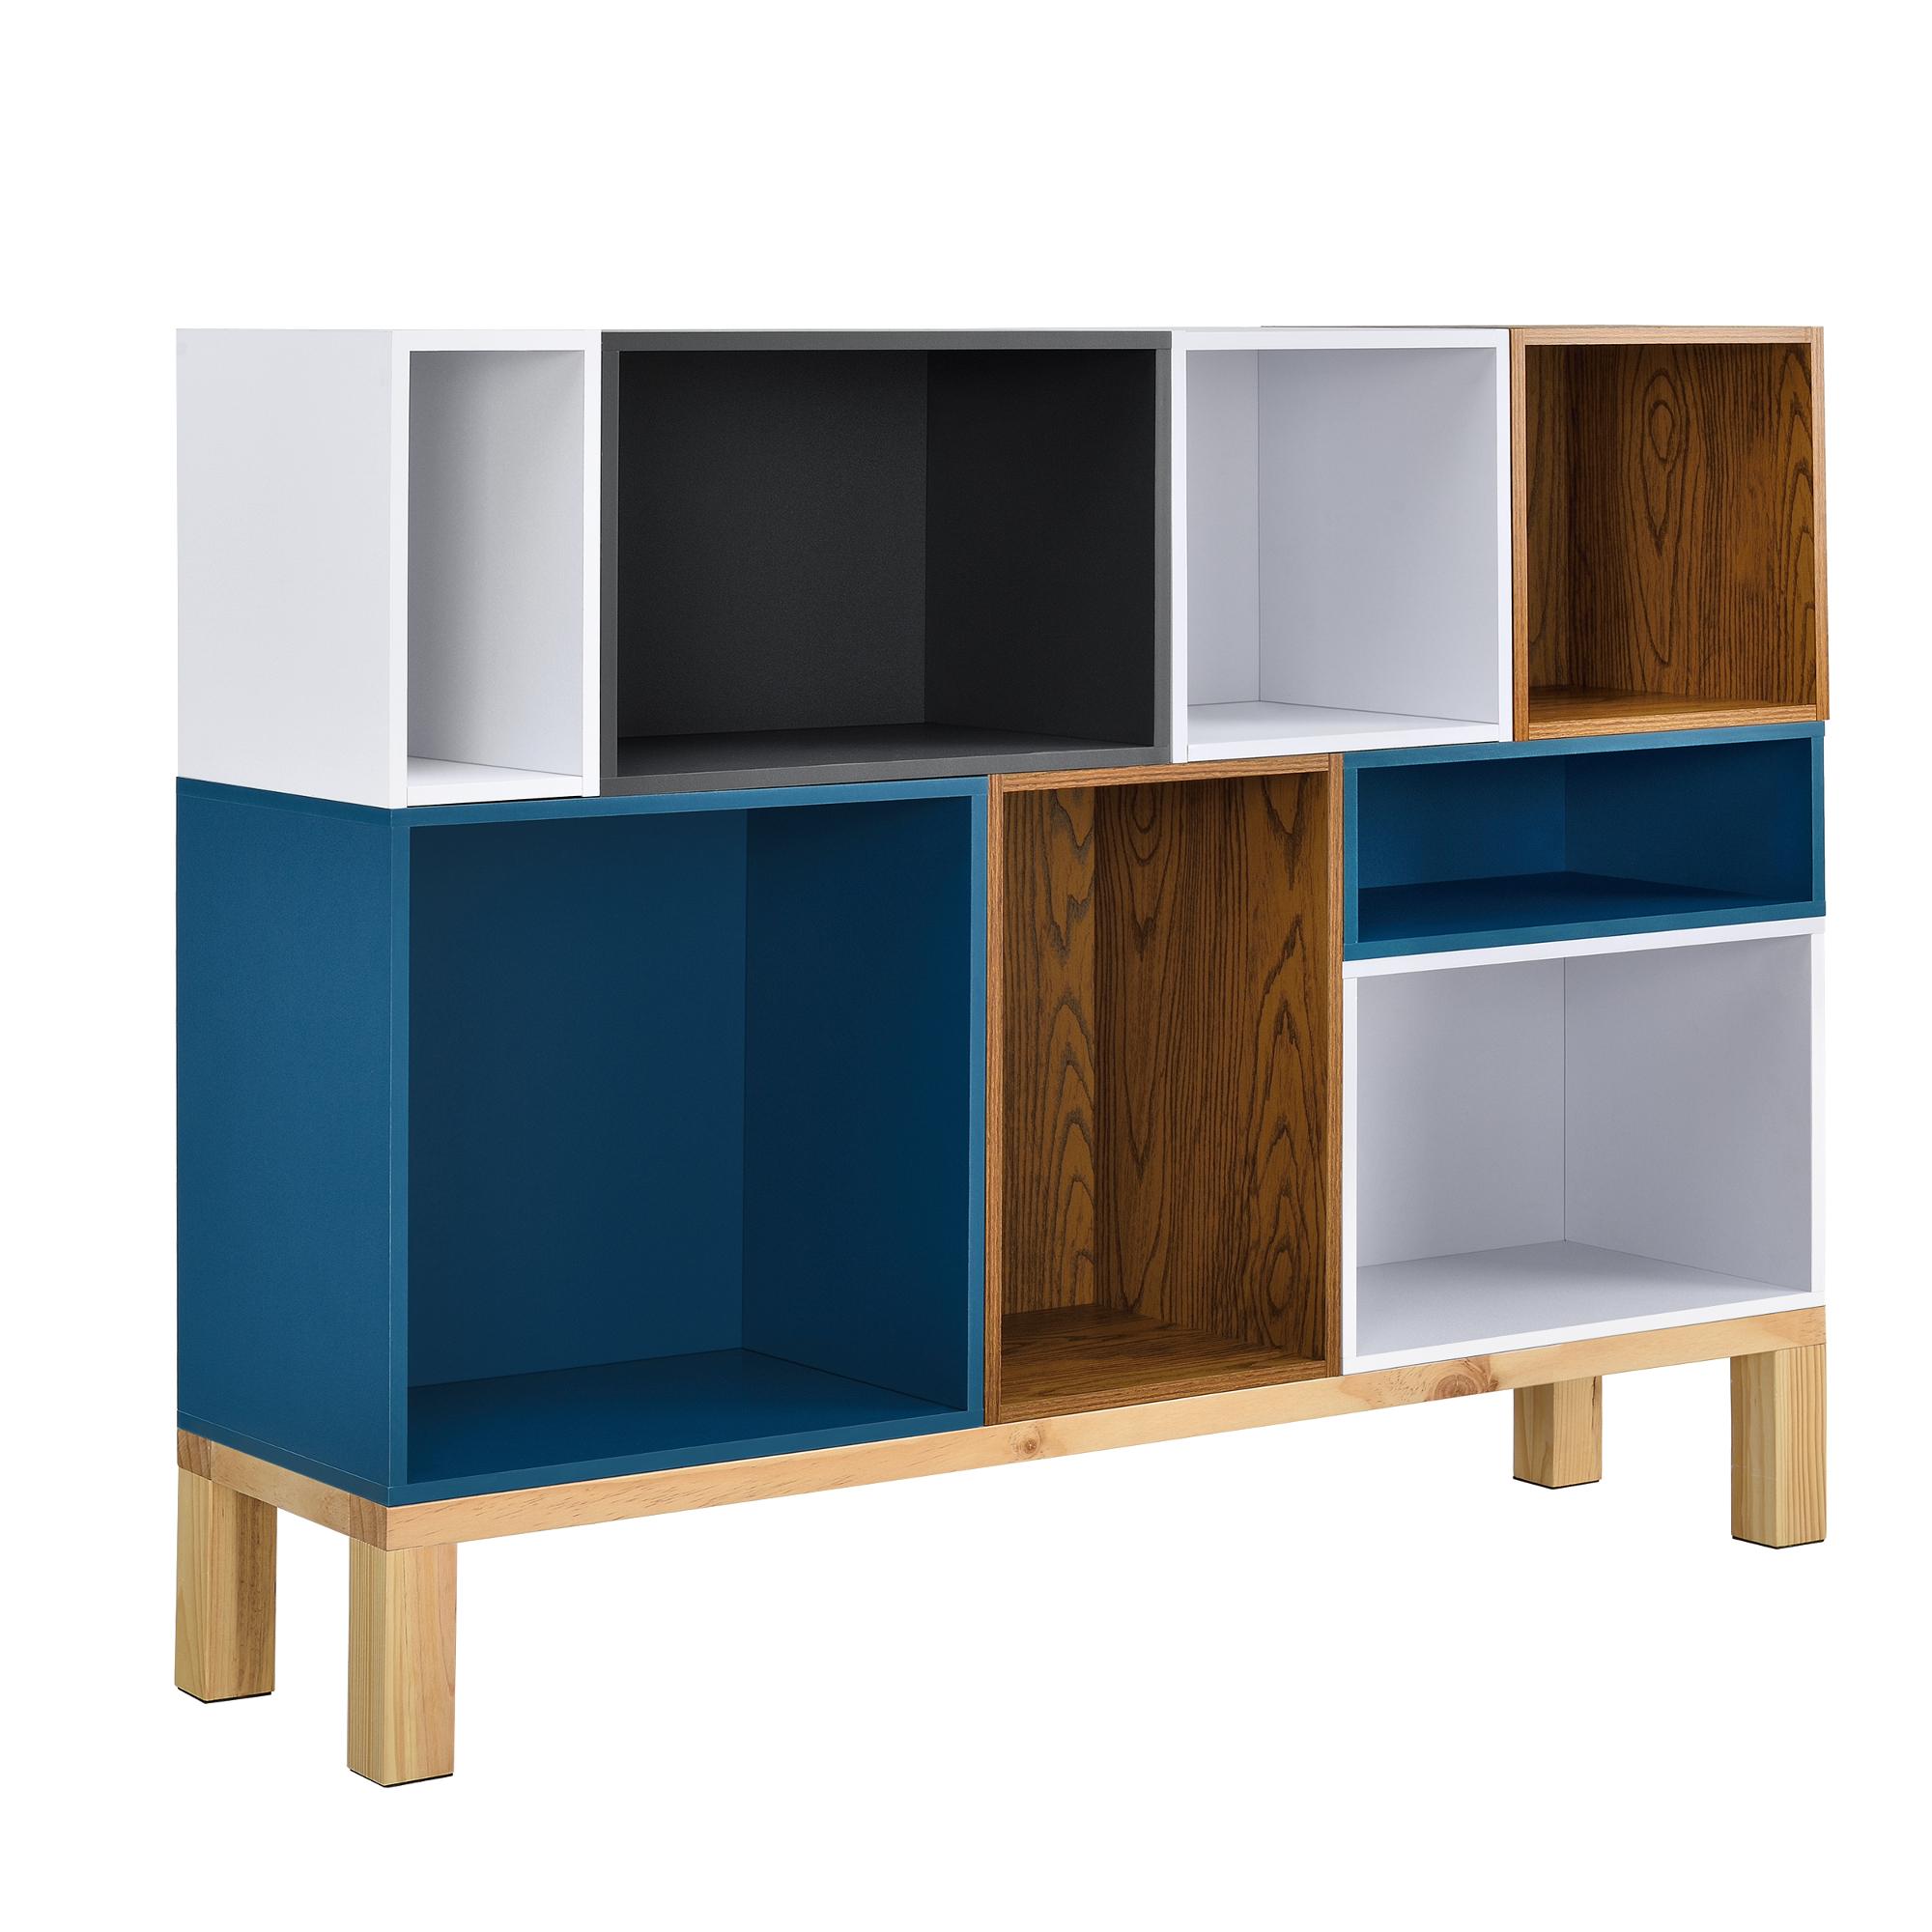 regal 75x15x15cm wei wandregal h ngeregal. Black Bedroom Furniture Sets. Home Design Ideas